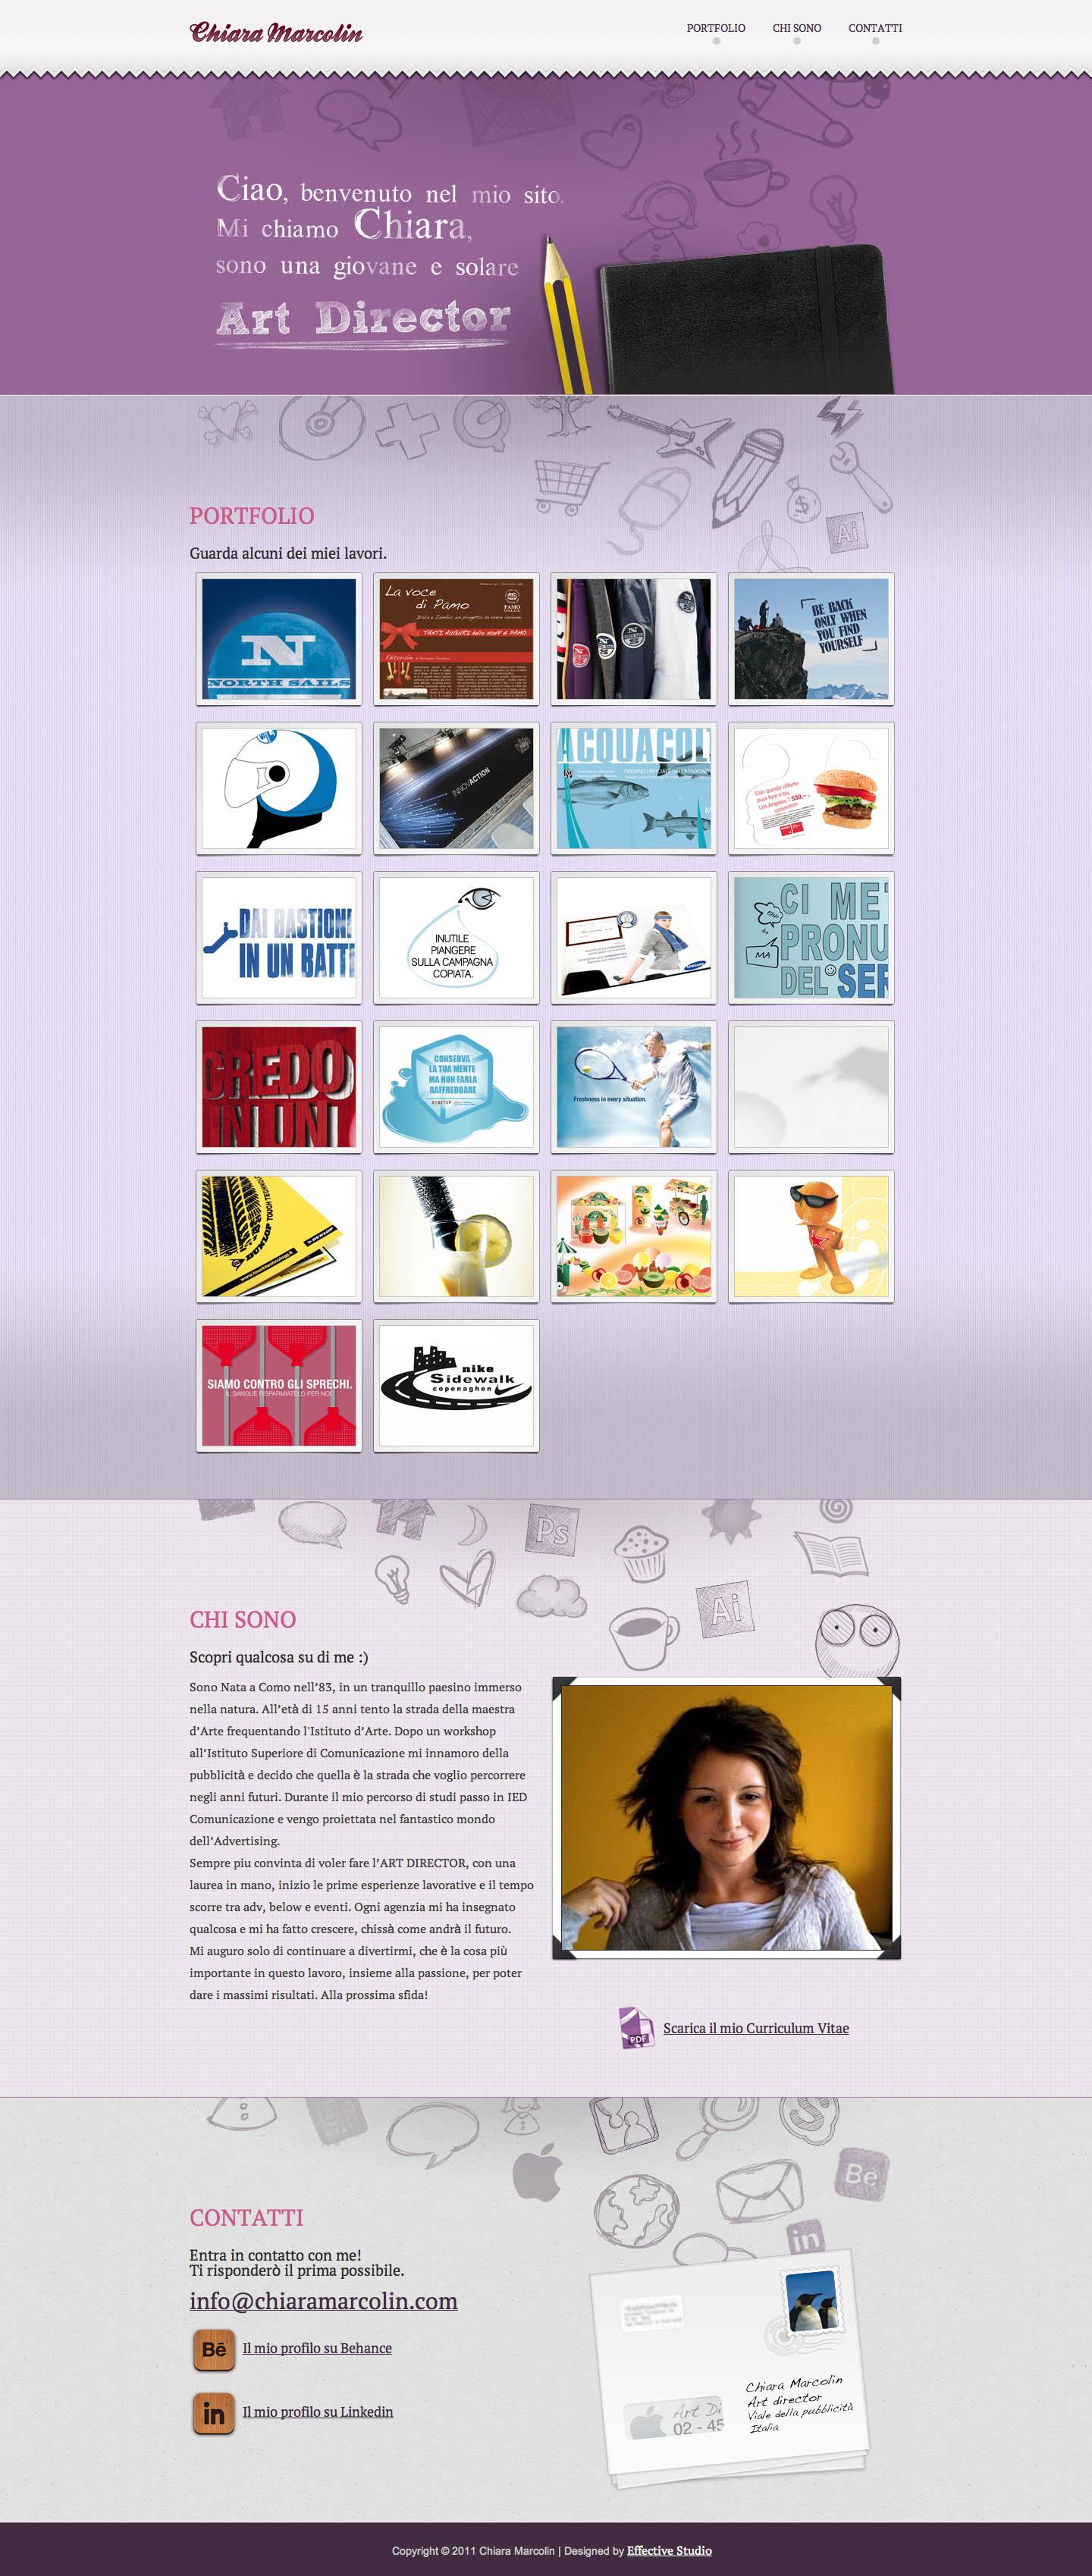 Chiara Marcolin Website Screenshot